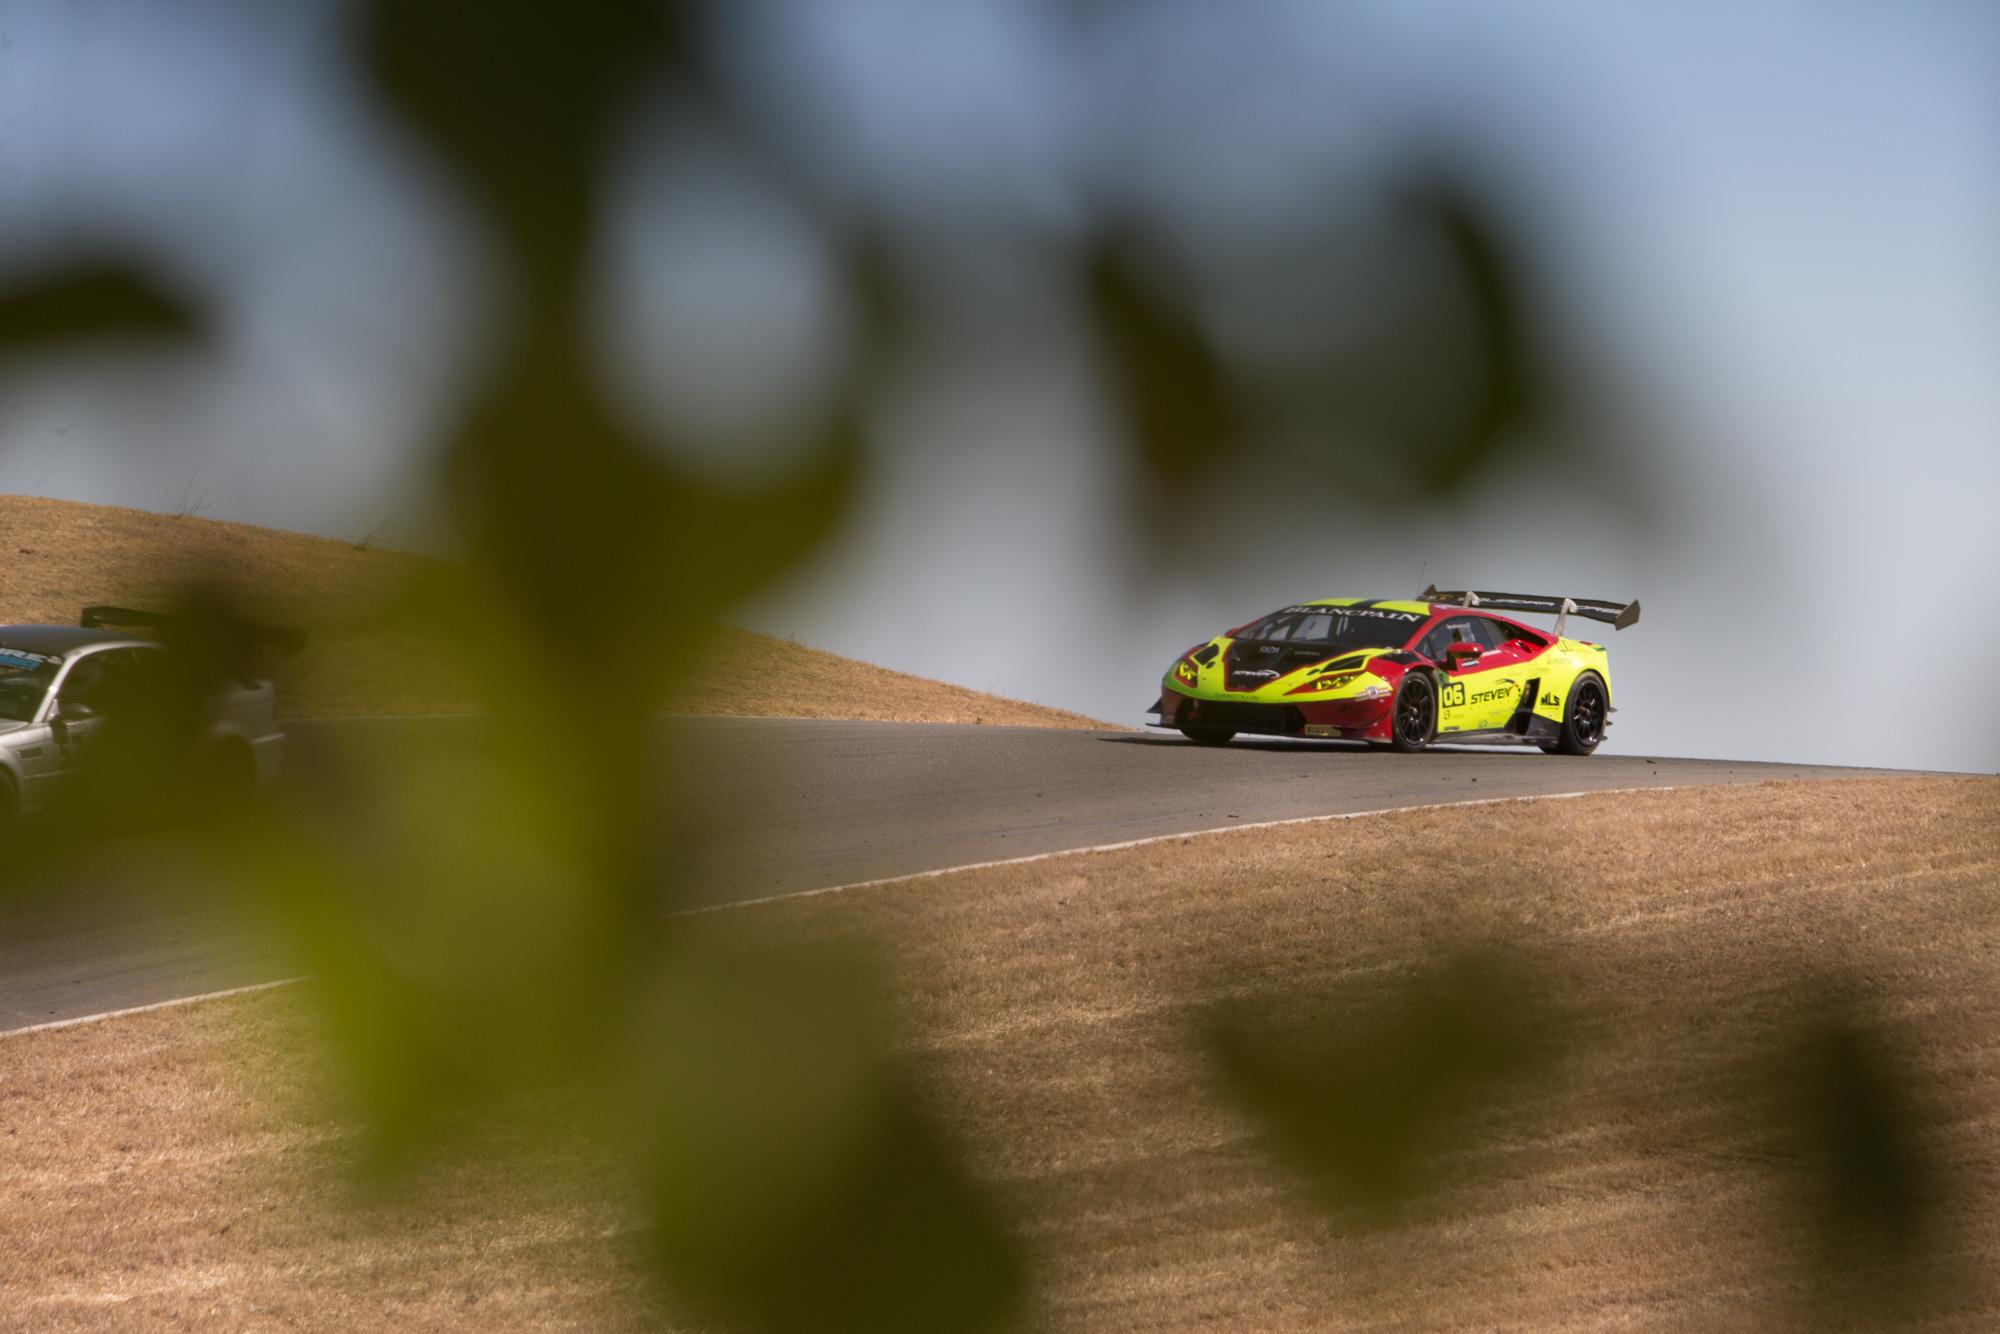 Steven-Racing-20171005-44609.jpg